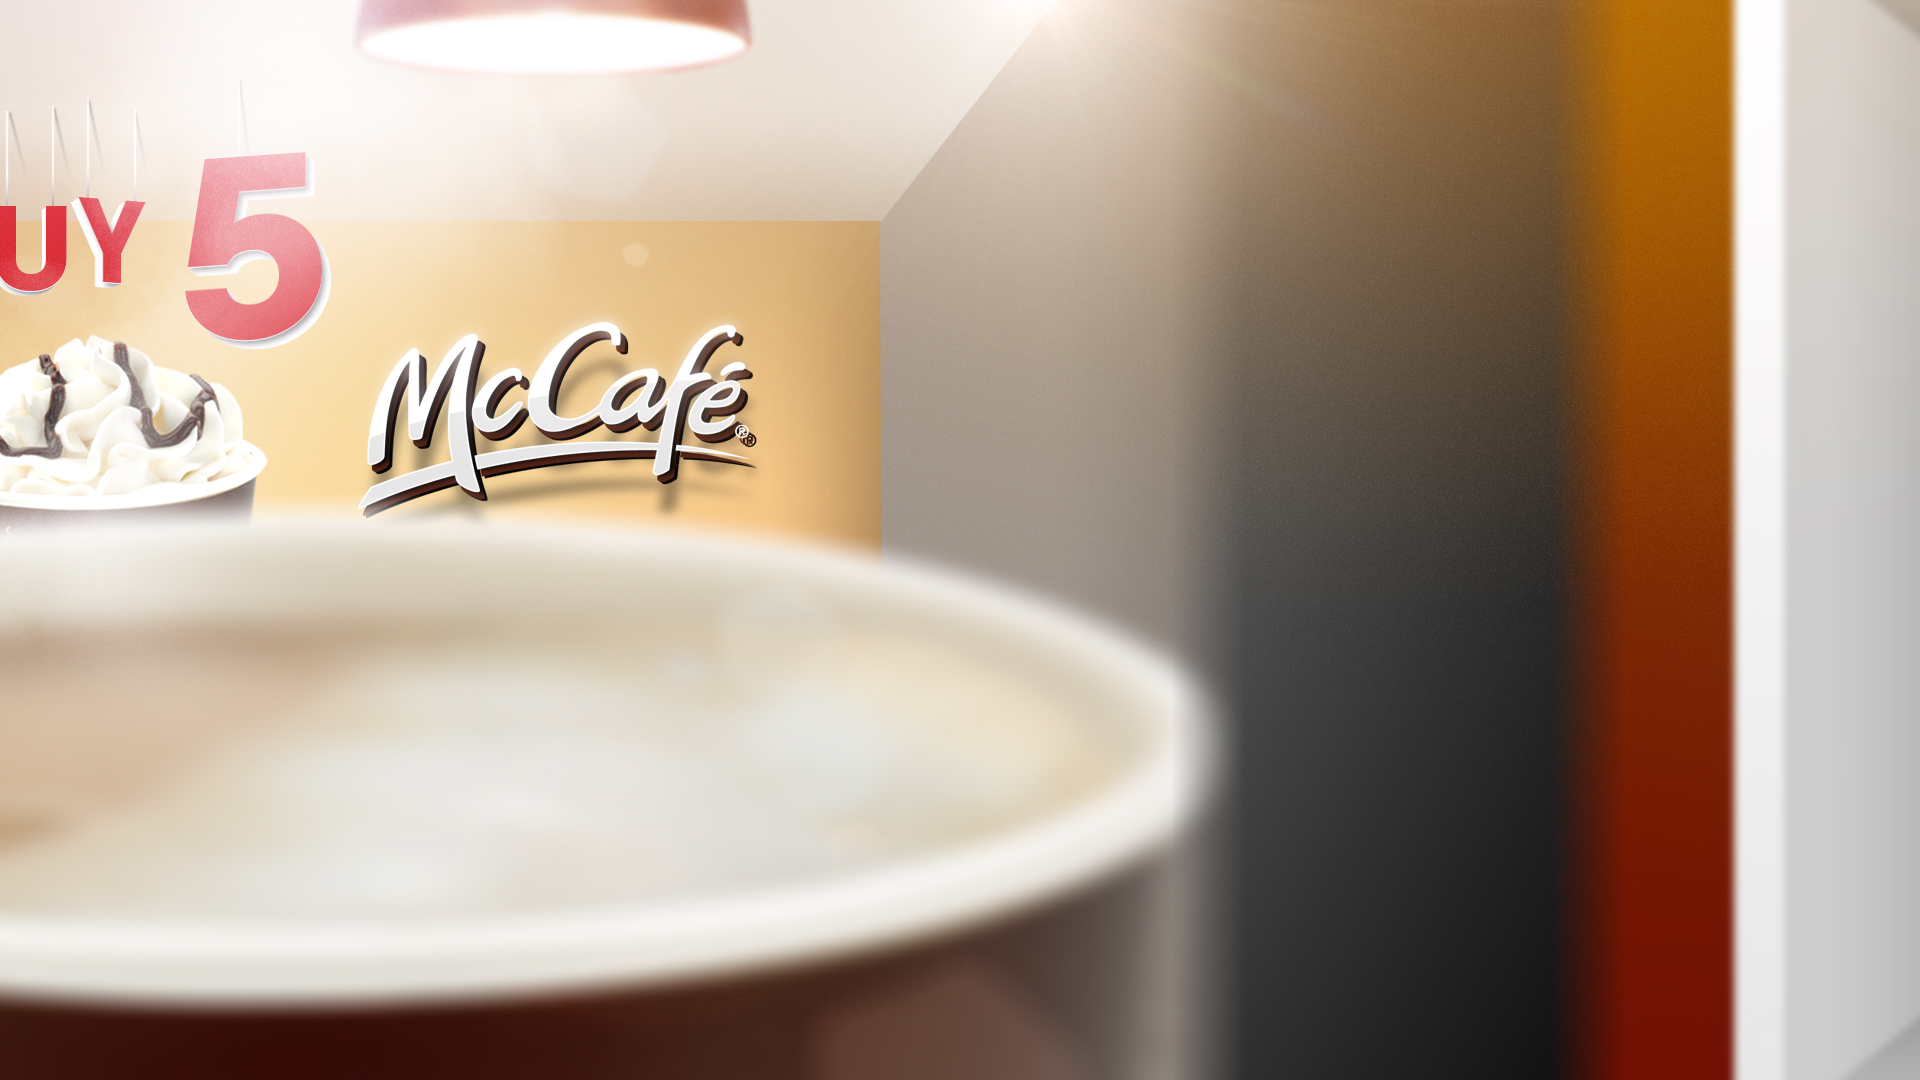 McD_McCafe_09.jpg